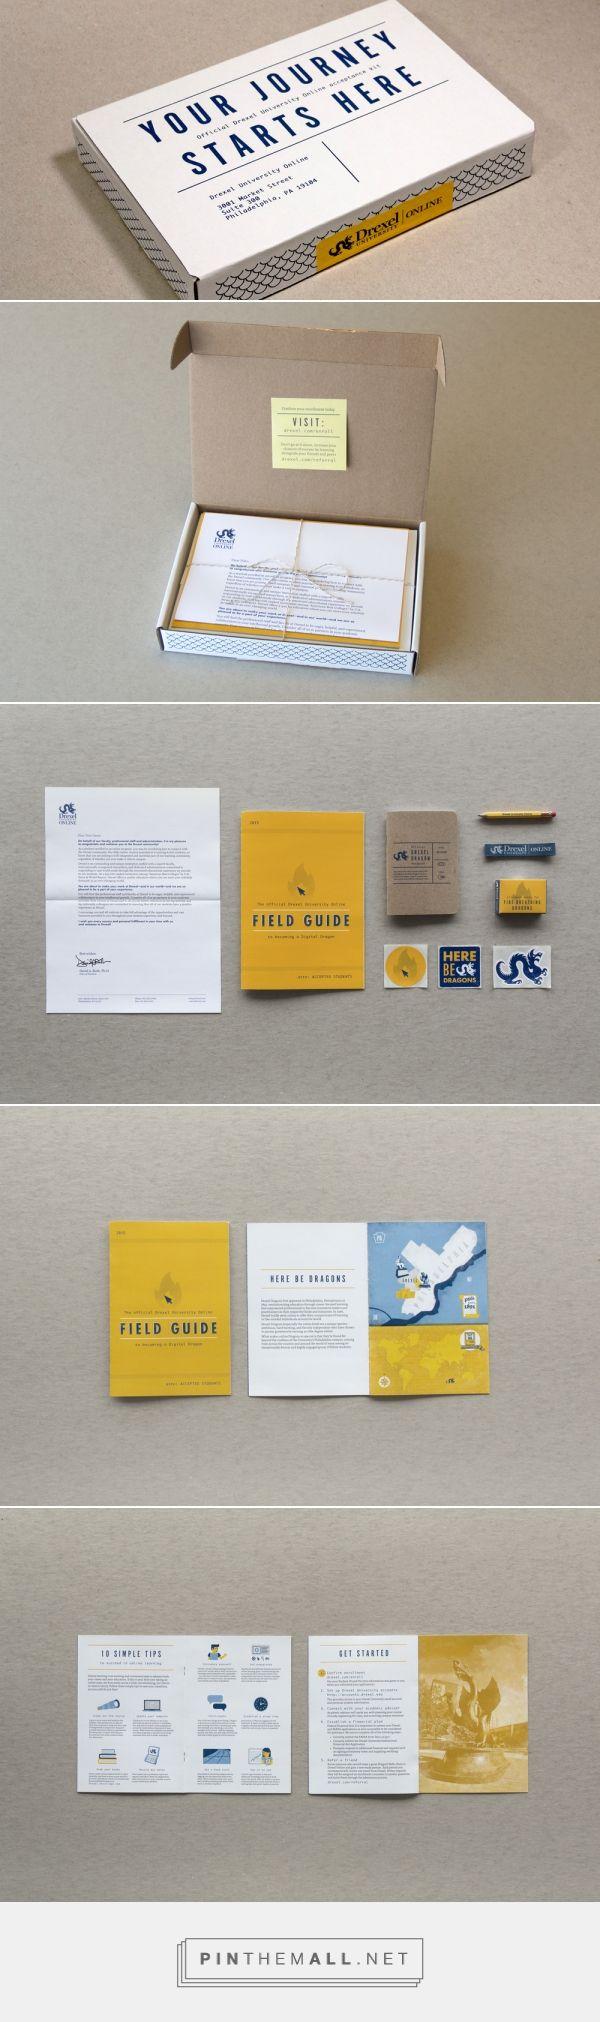 Drexel University Online Accepted Students Kit — The Dieline - Branding & Packaging Design - created via https://pinthemall.net